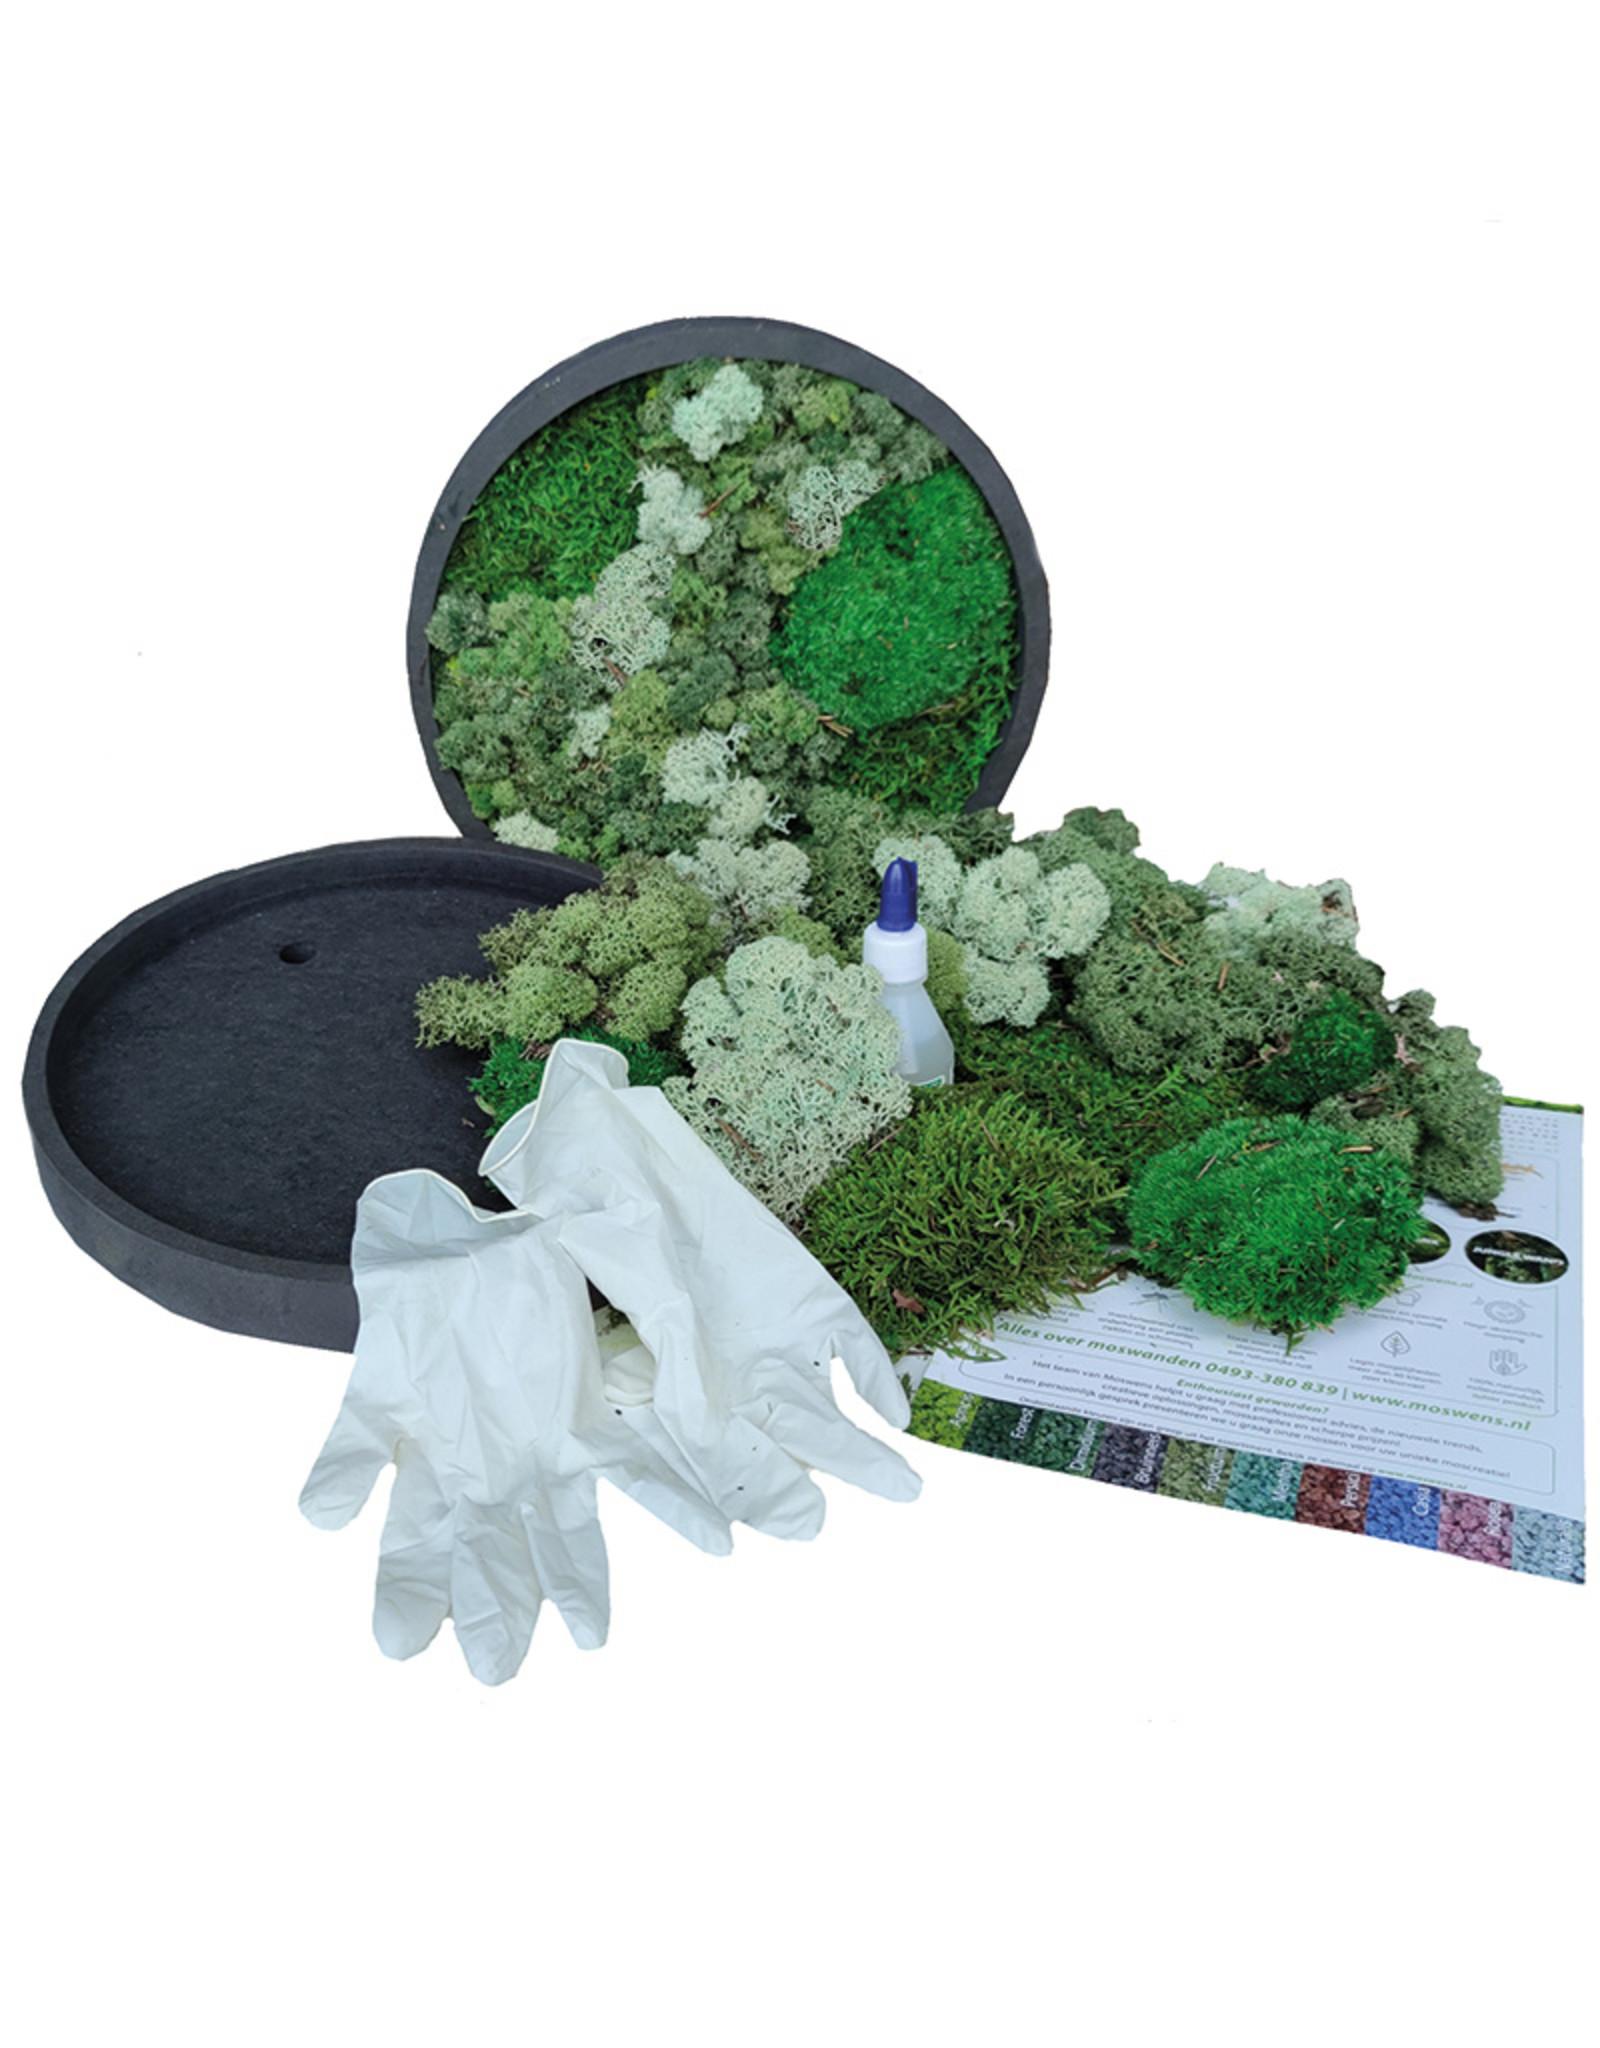 Moswens [DIY] pakket met mint kleur en groentinten